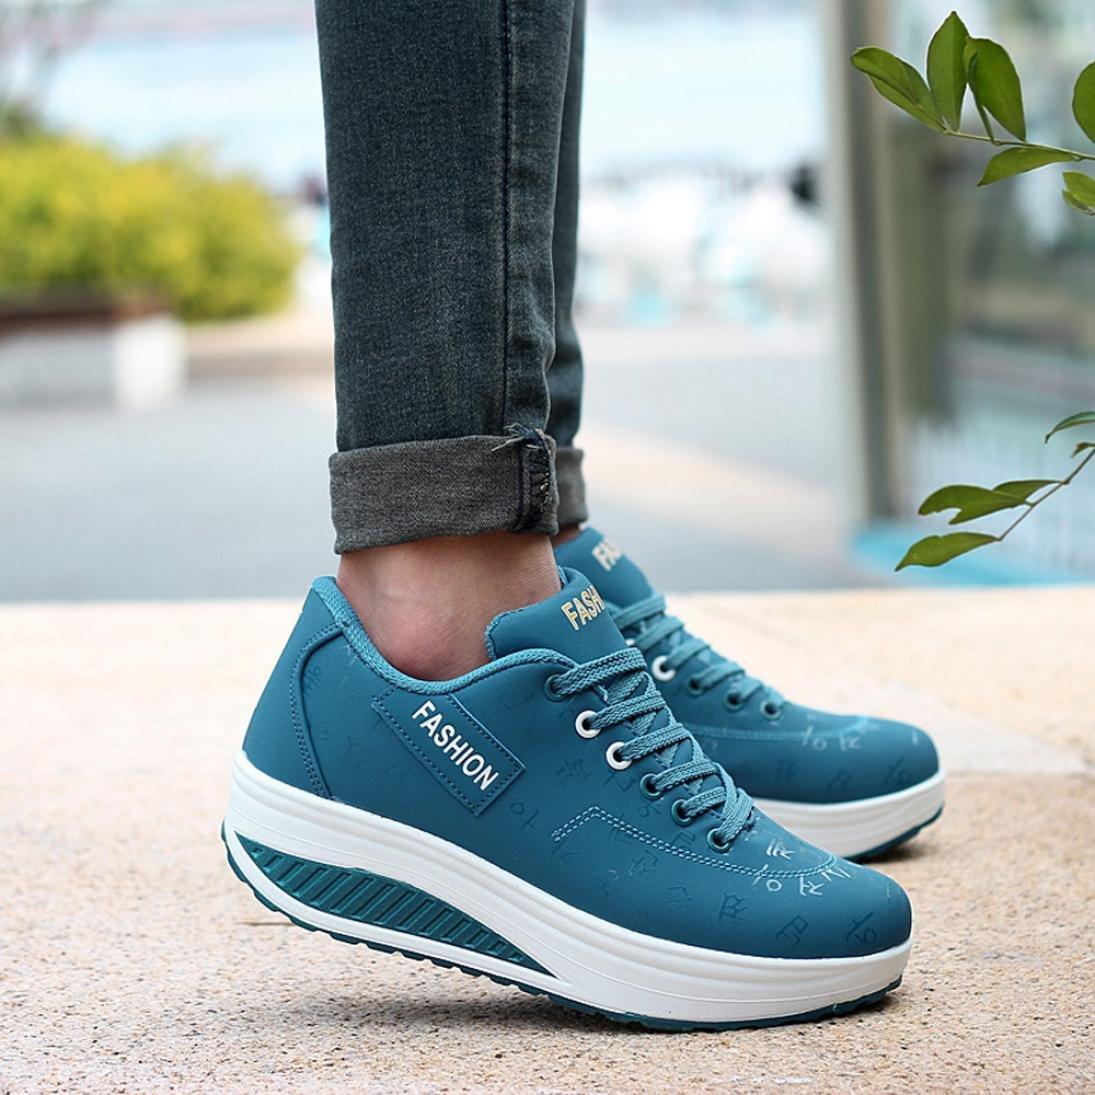 5a0a0d7589 Elecenty scarpa sneakers estive eleganti donna scarpe Scarpa a zeppa  altalena crescente per donna